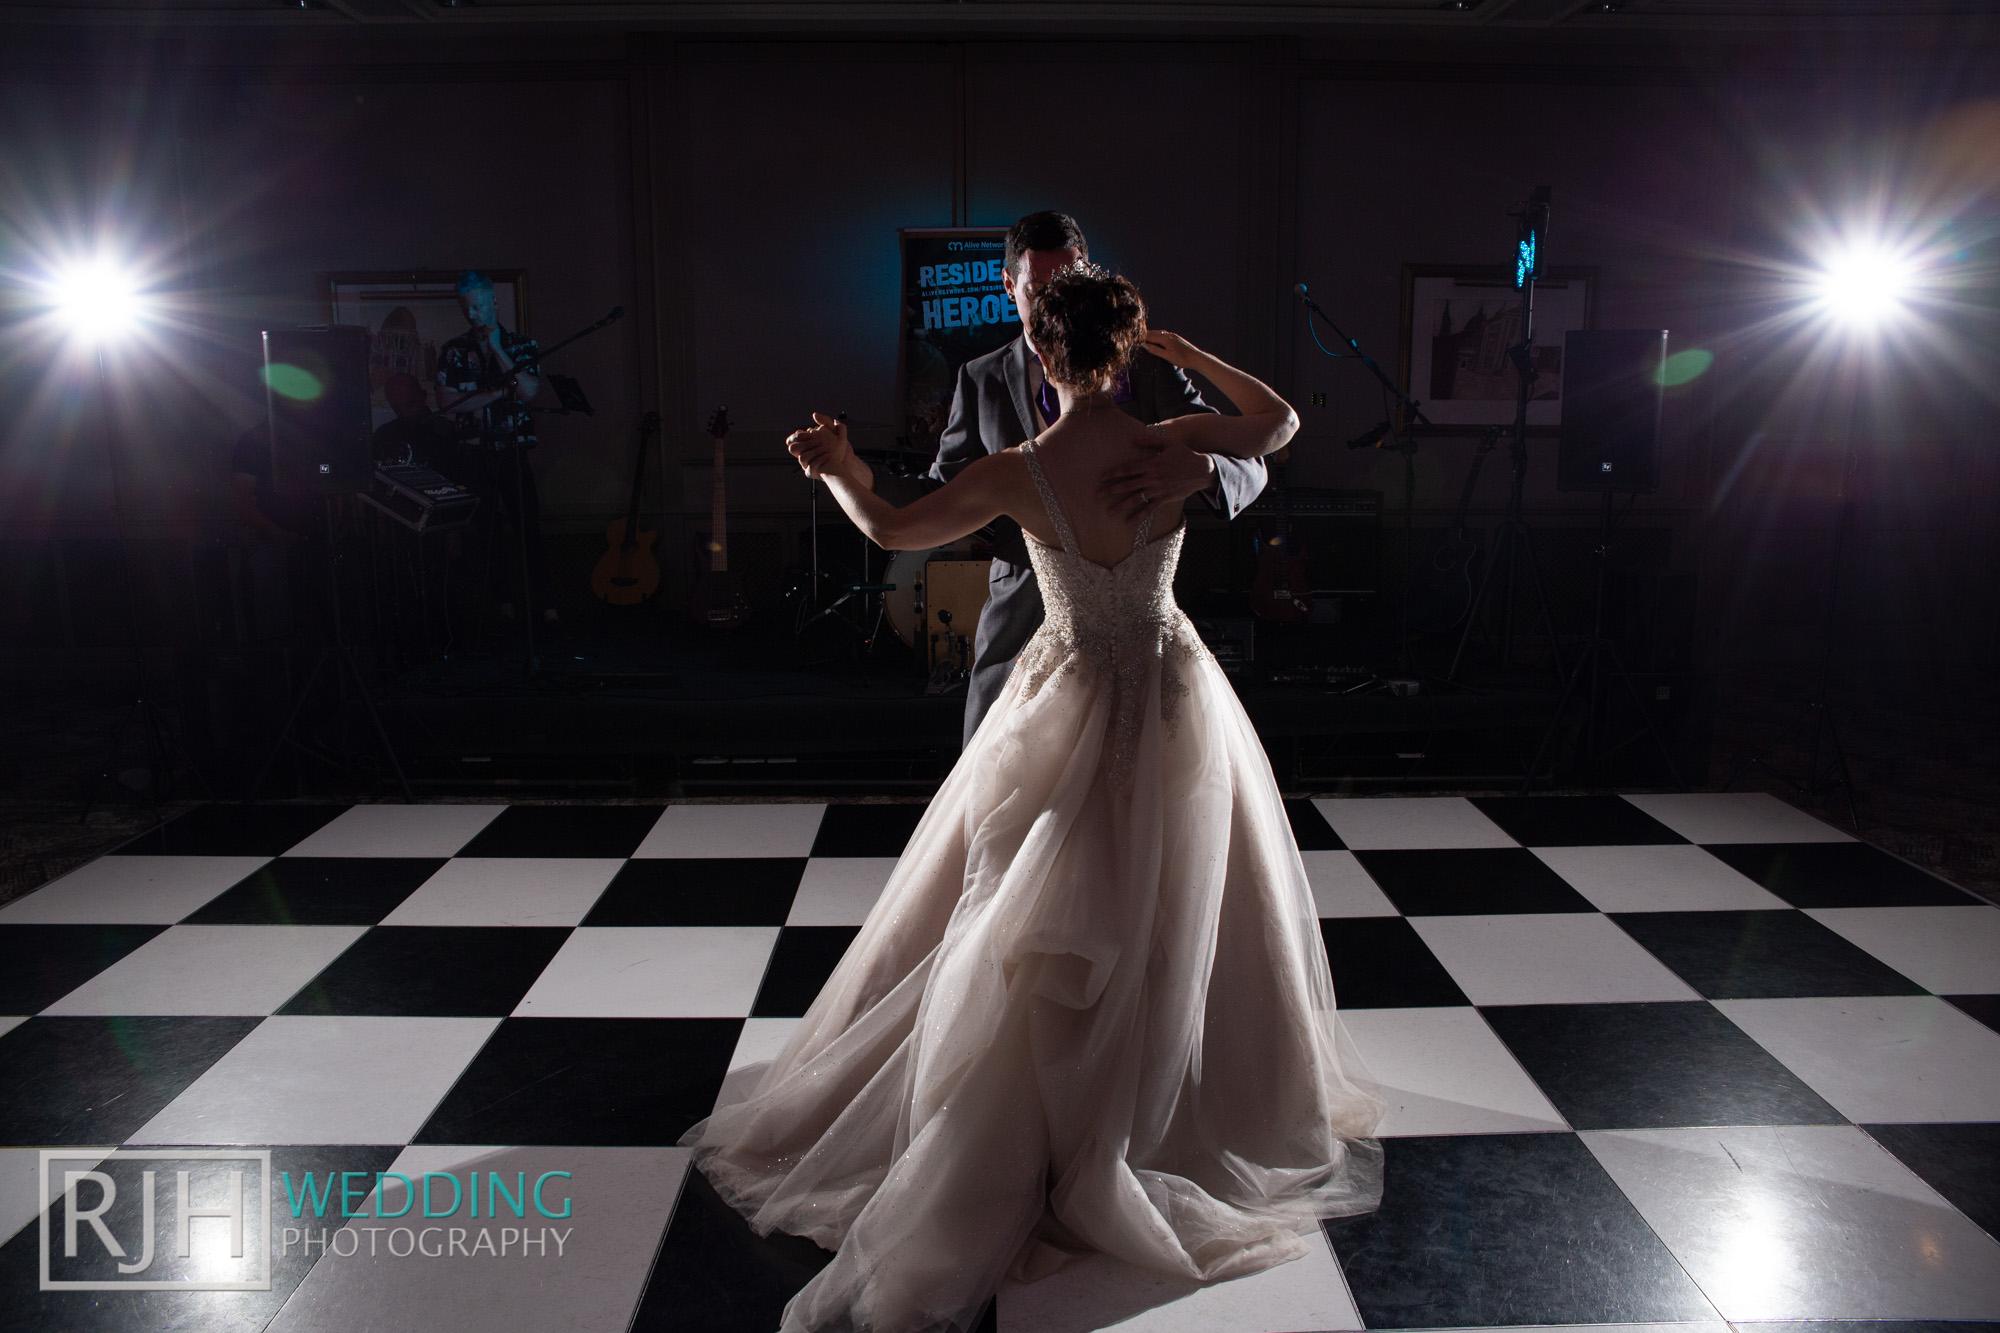 Oulton Hall Wedding Photography_Goodwill-Hall_056_IMG_7001.jpg